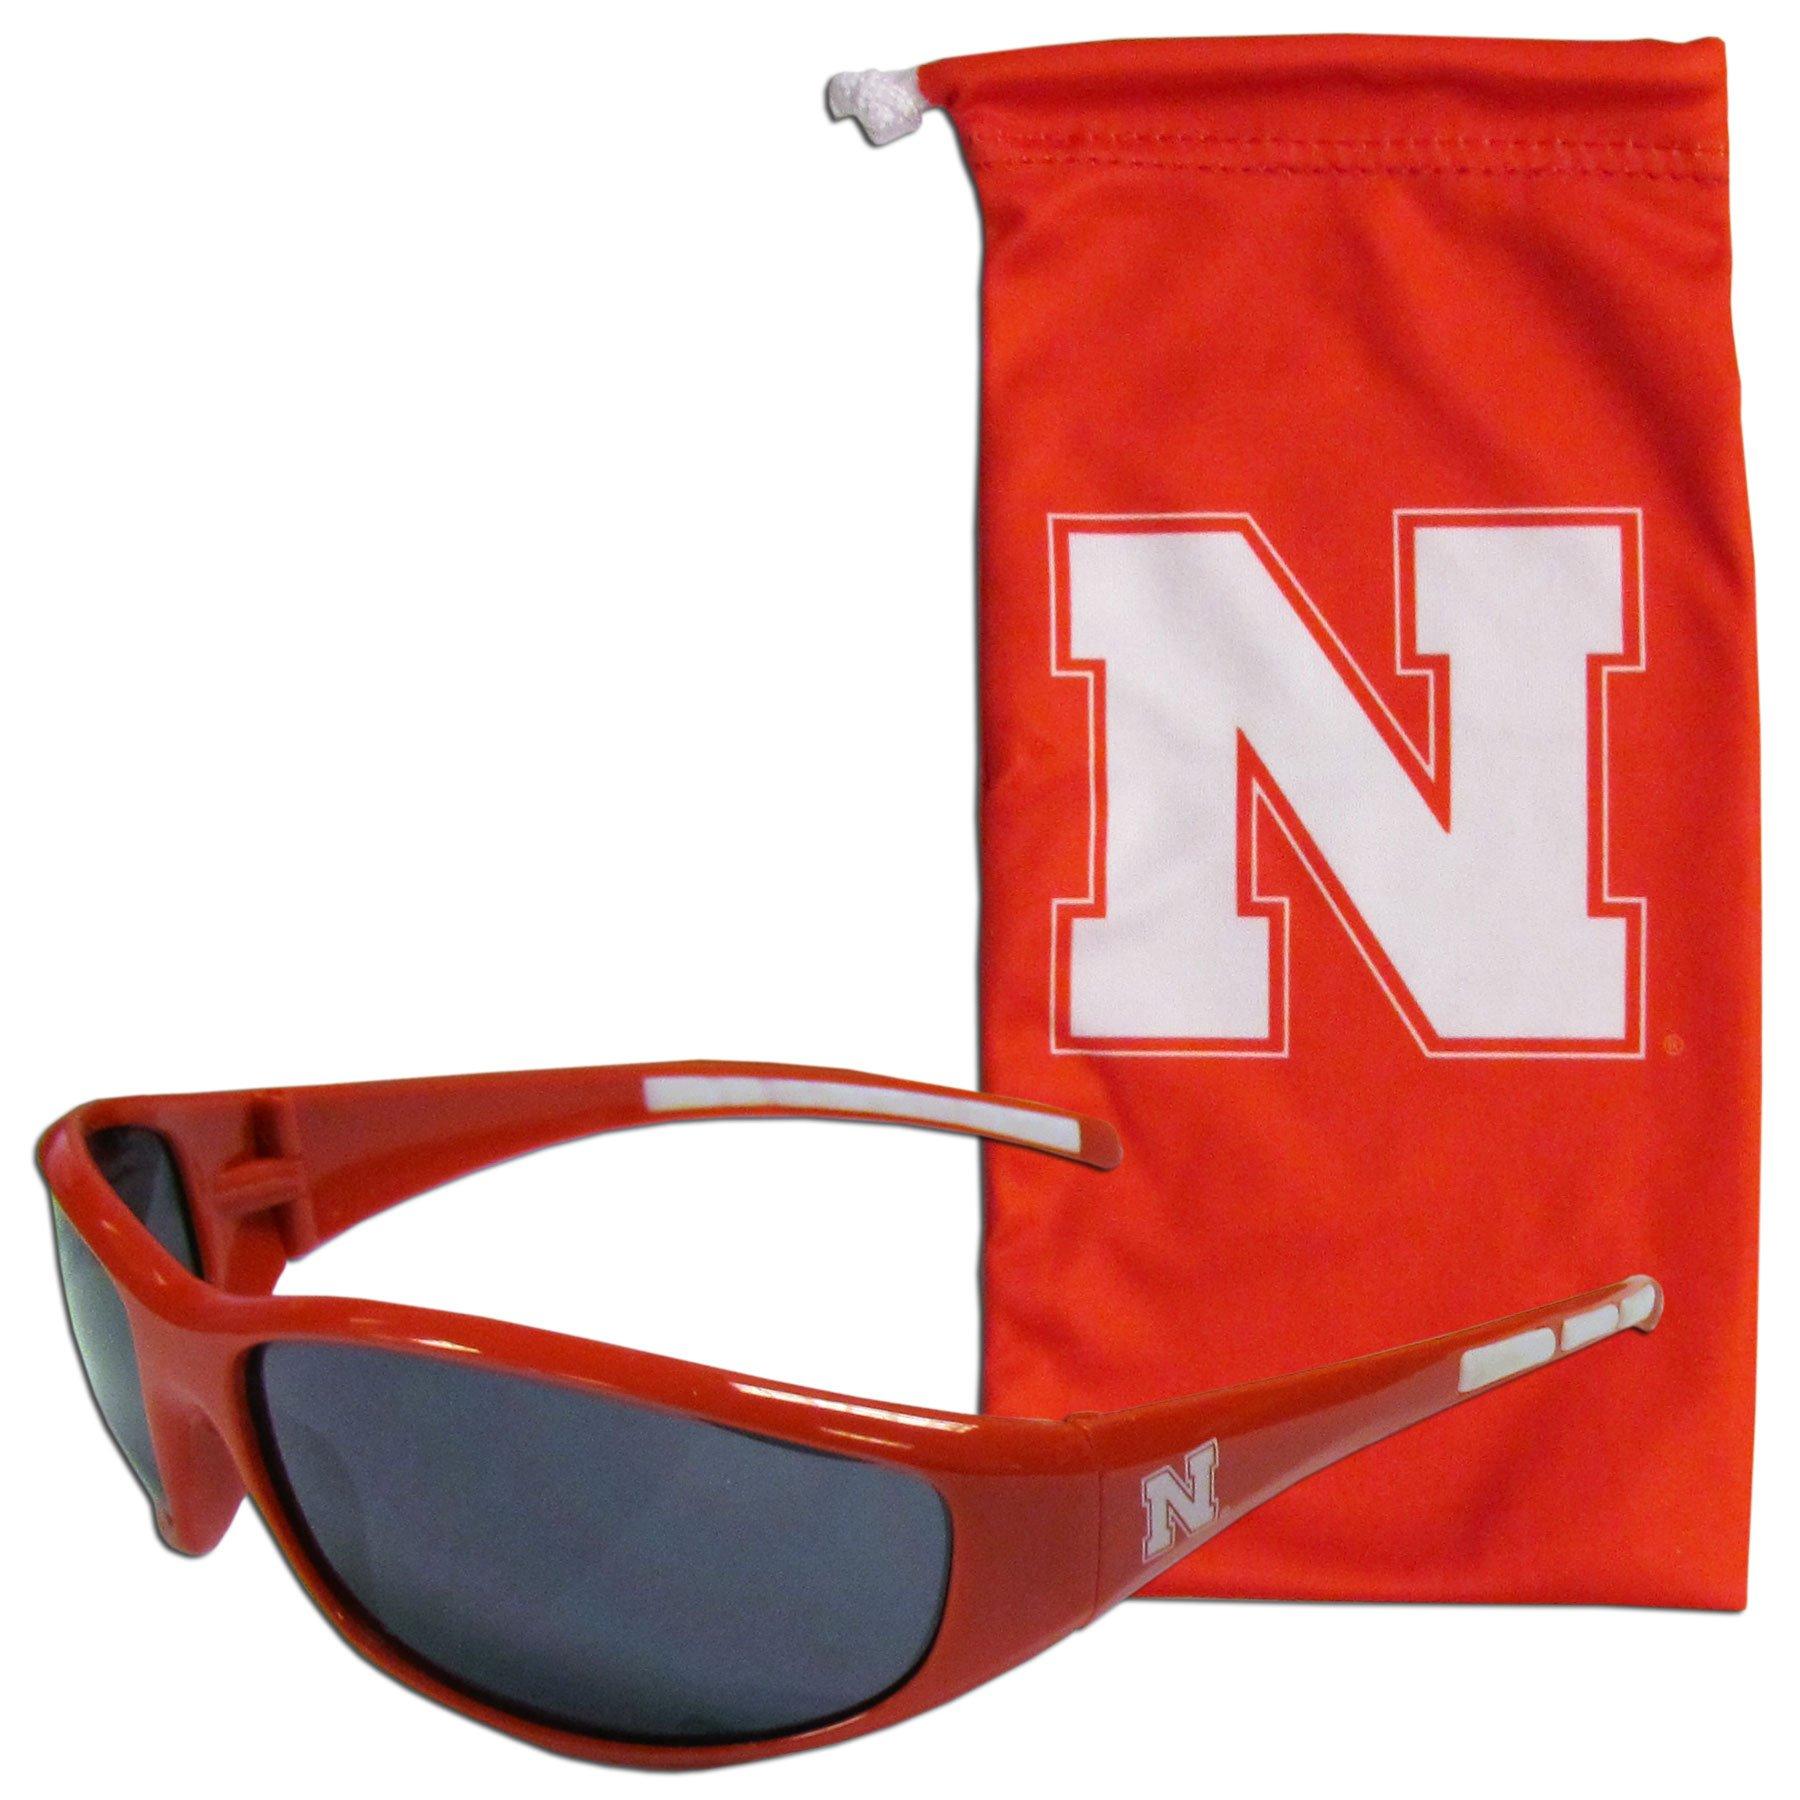 Siskiyou NCAA Nebraska Cornhuskers Adult Sunglass and Bag Set, Red